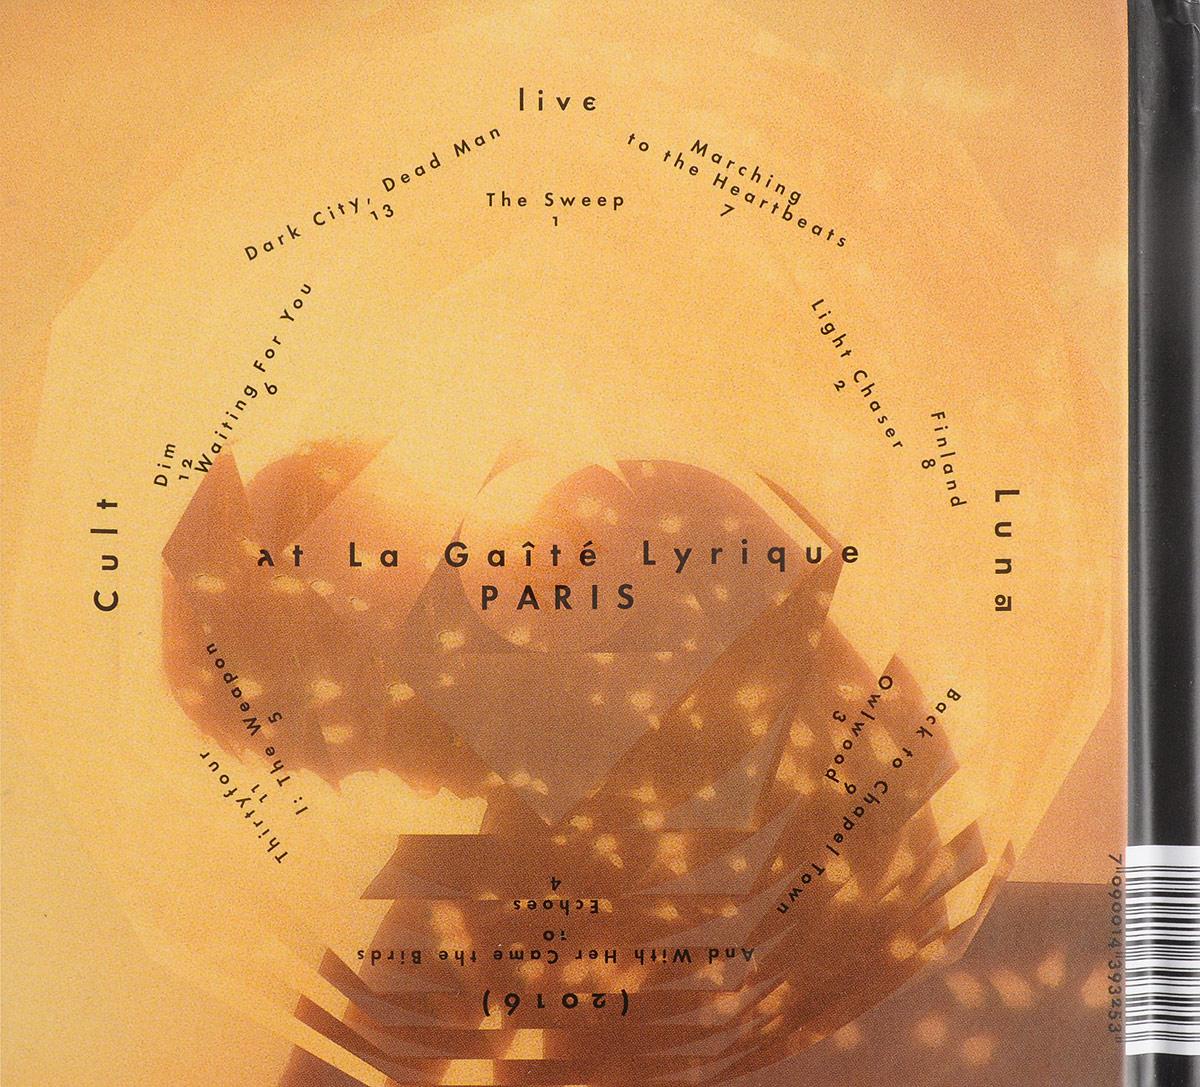 Cult Of Luna:  Live At La Gaite Lyrique, Paris (DVD + 2 CD) Earache Records Ltd.